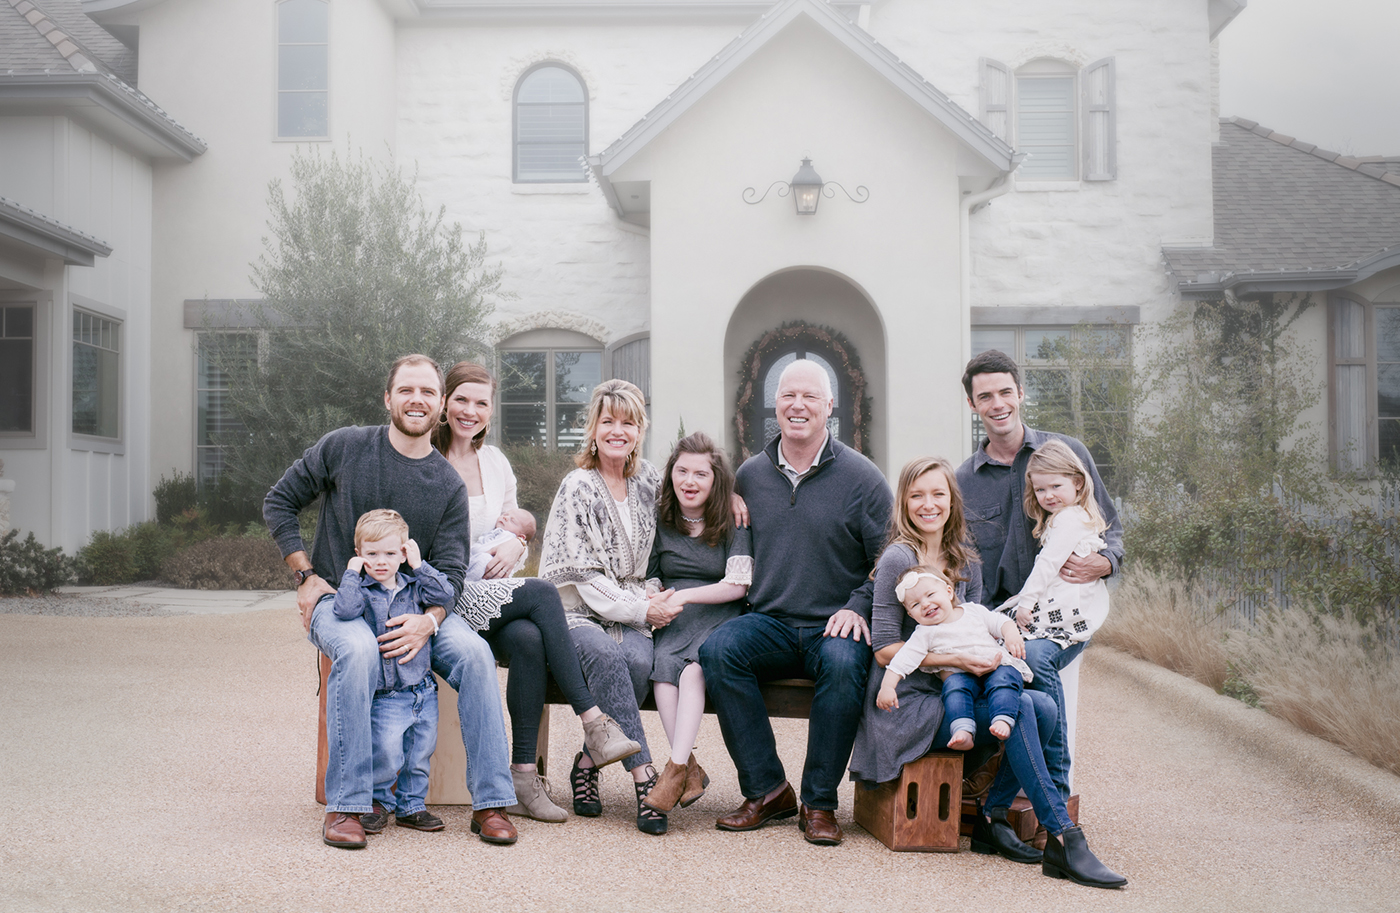 anna-kraft-photography-family-portrait-studio-georgetown19.jpg